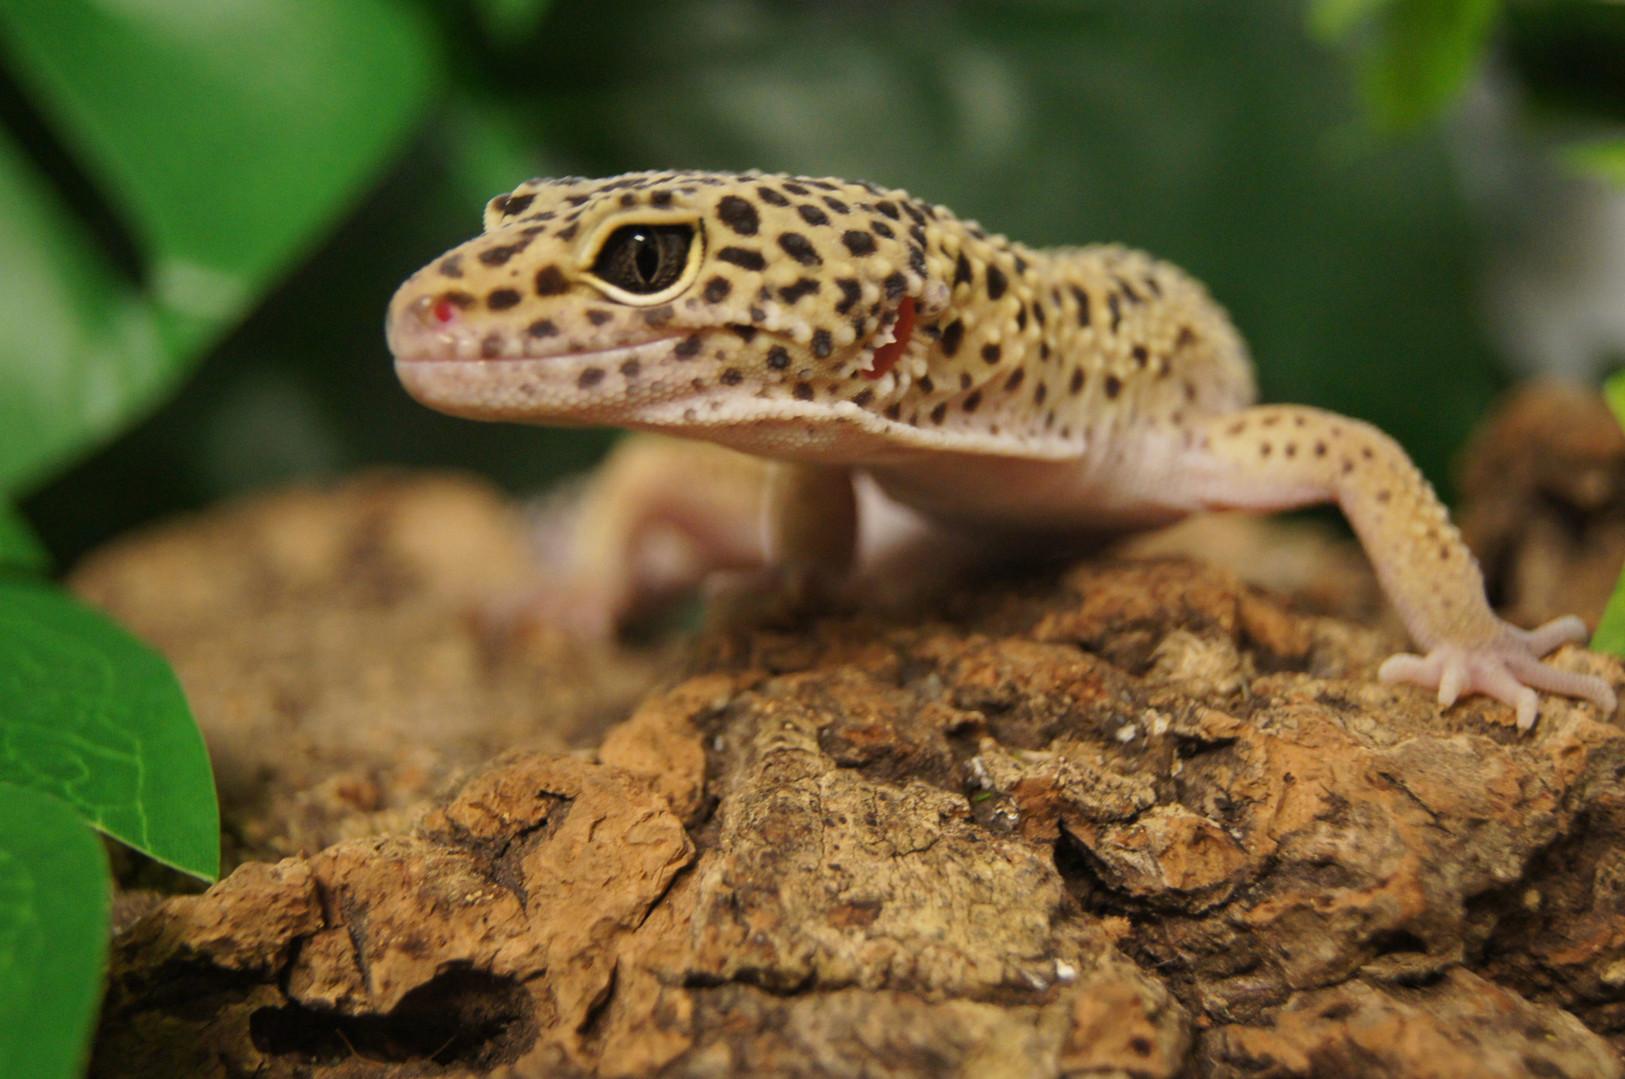 Dotty the leopard gecko